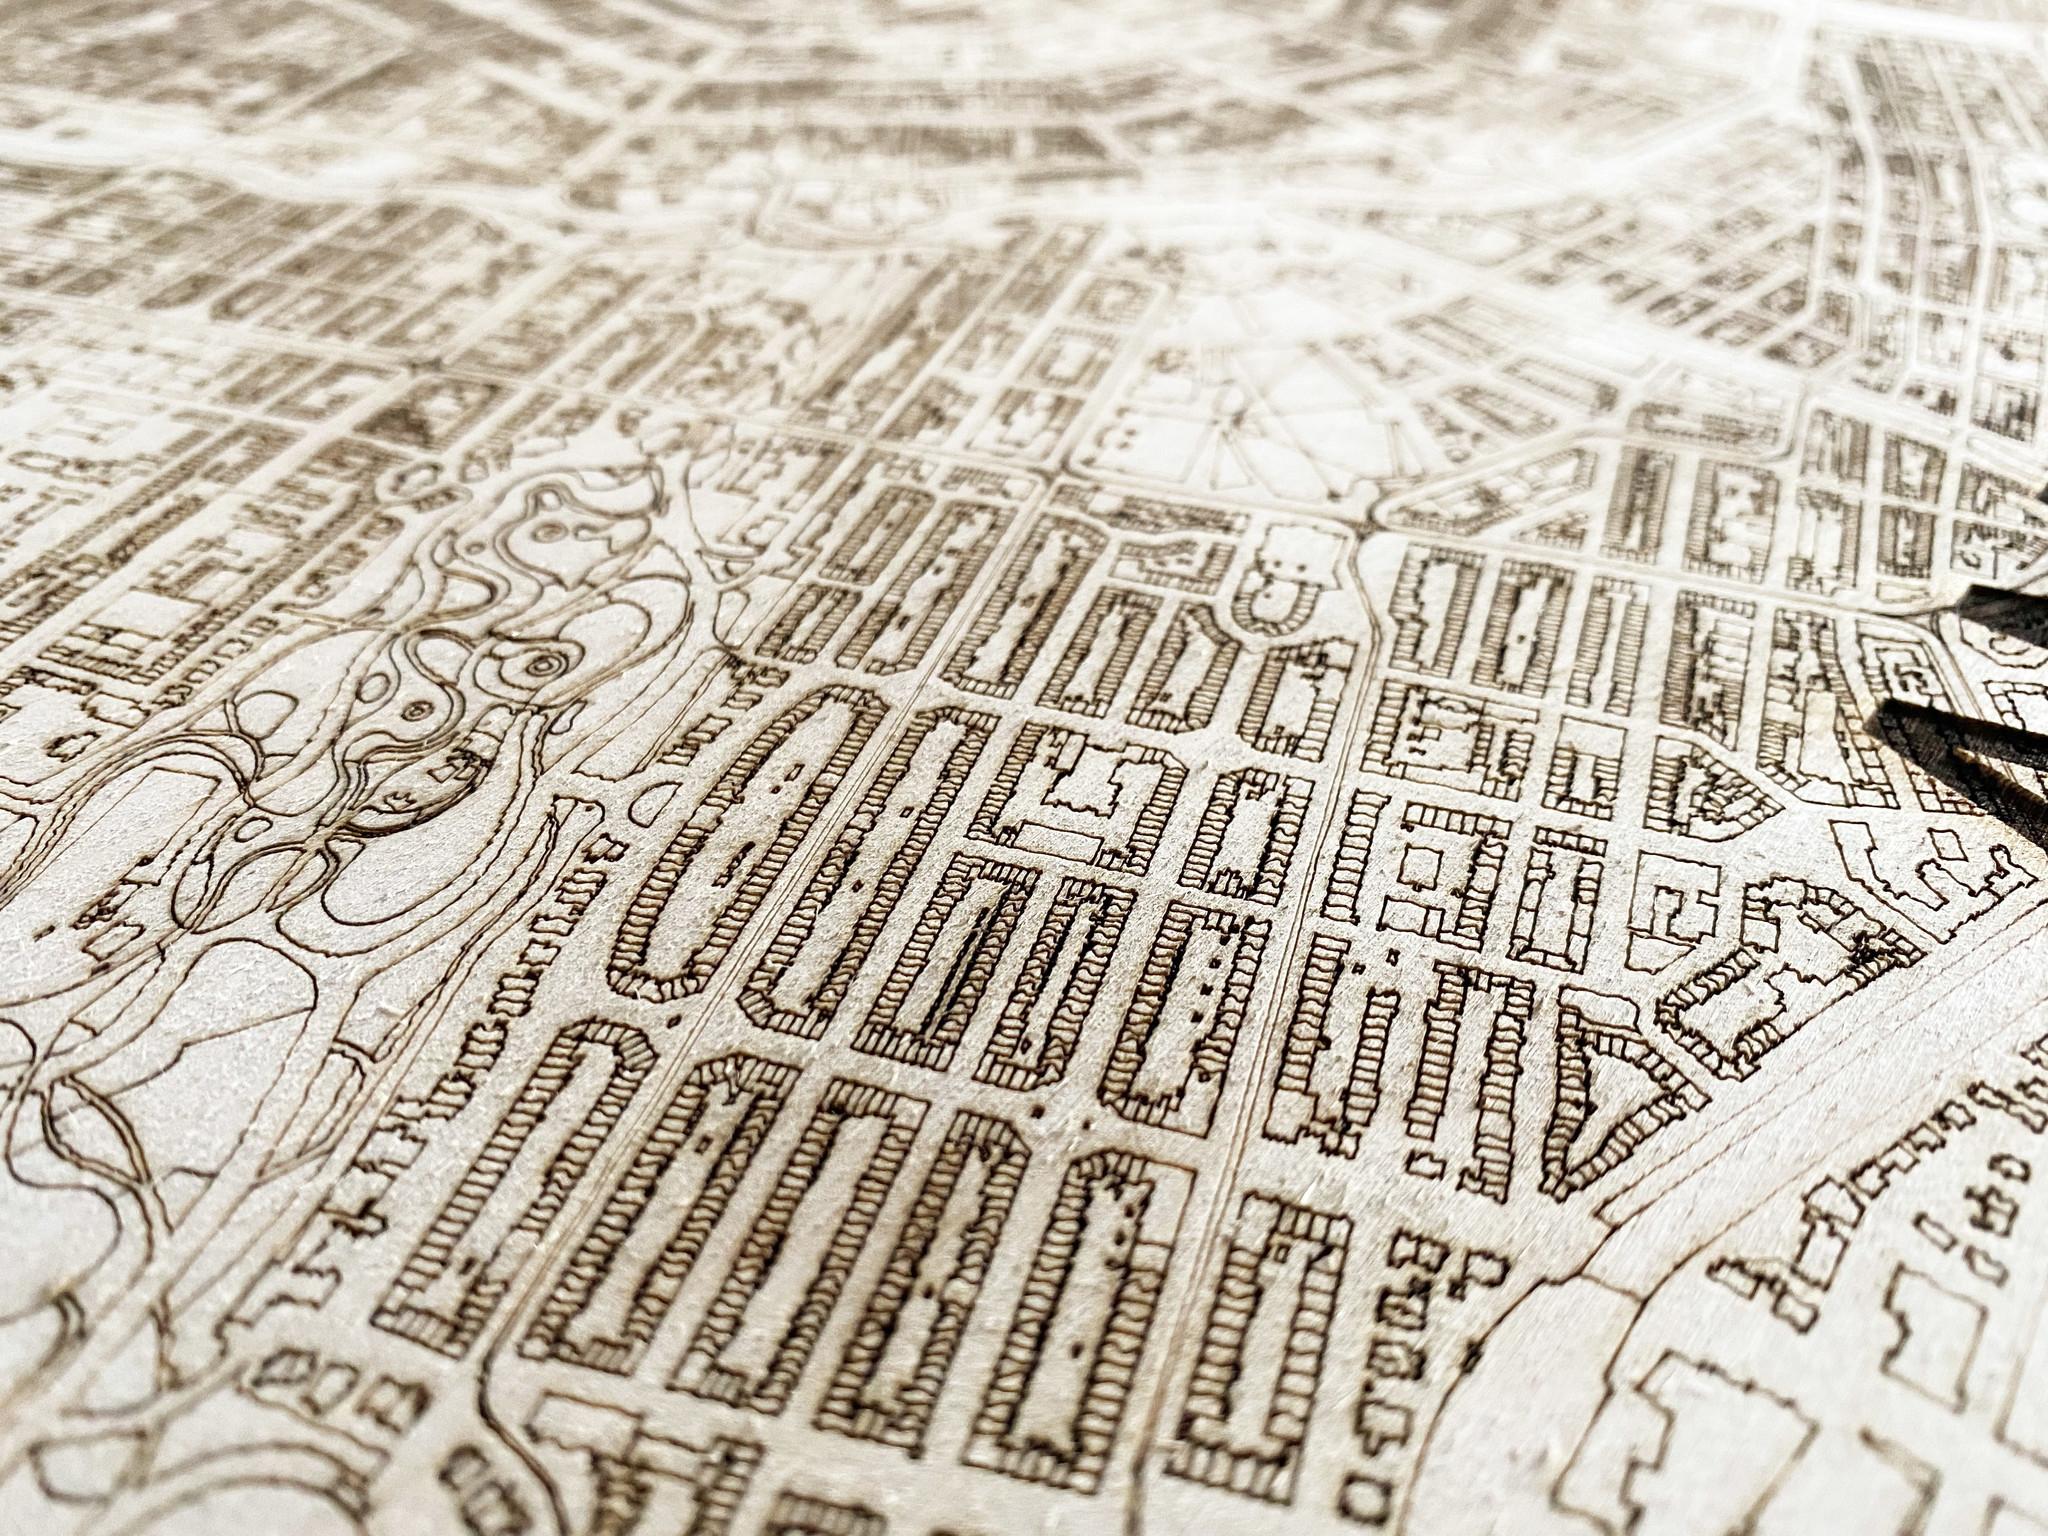 Houten stadsplattegrond Ede-2